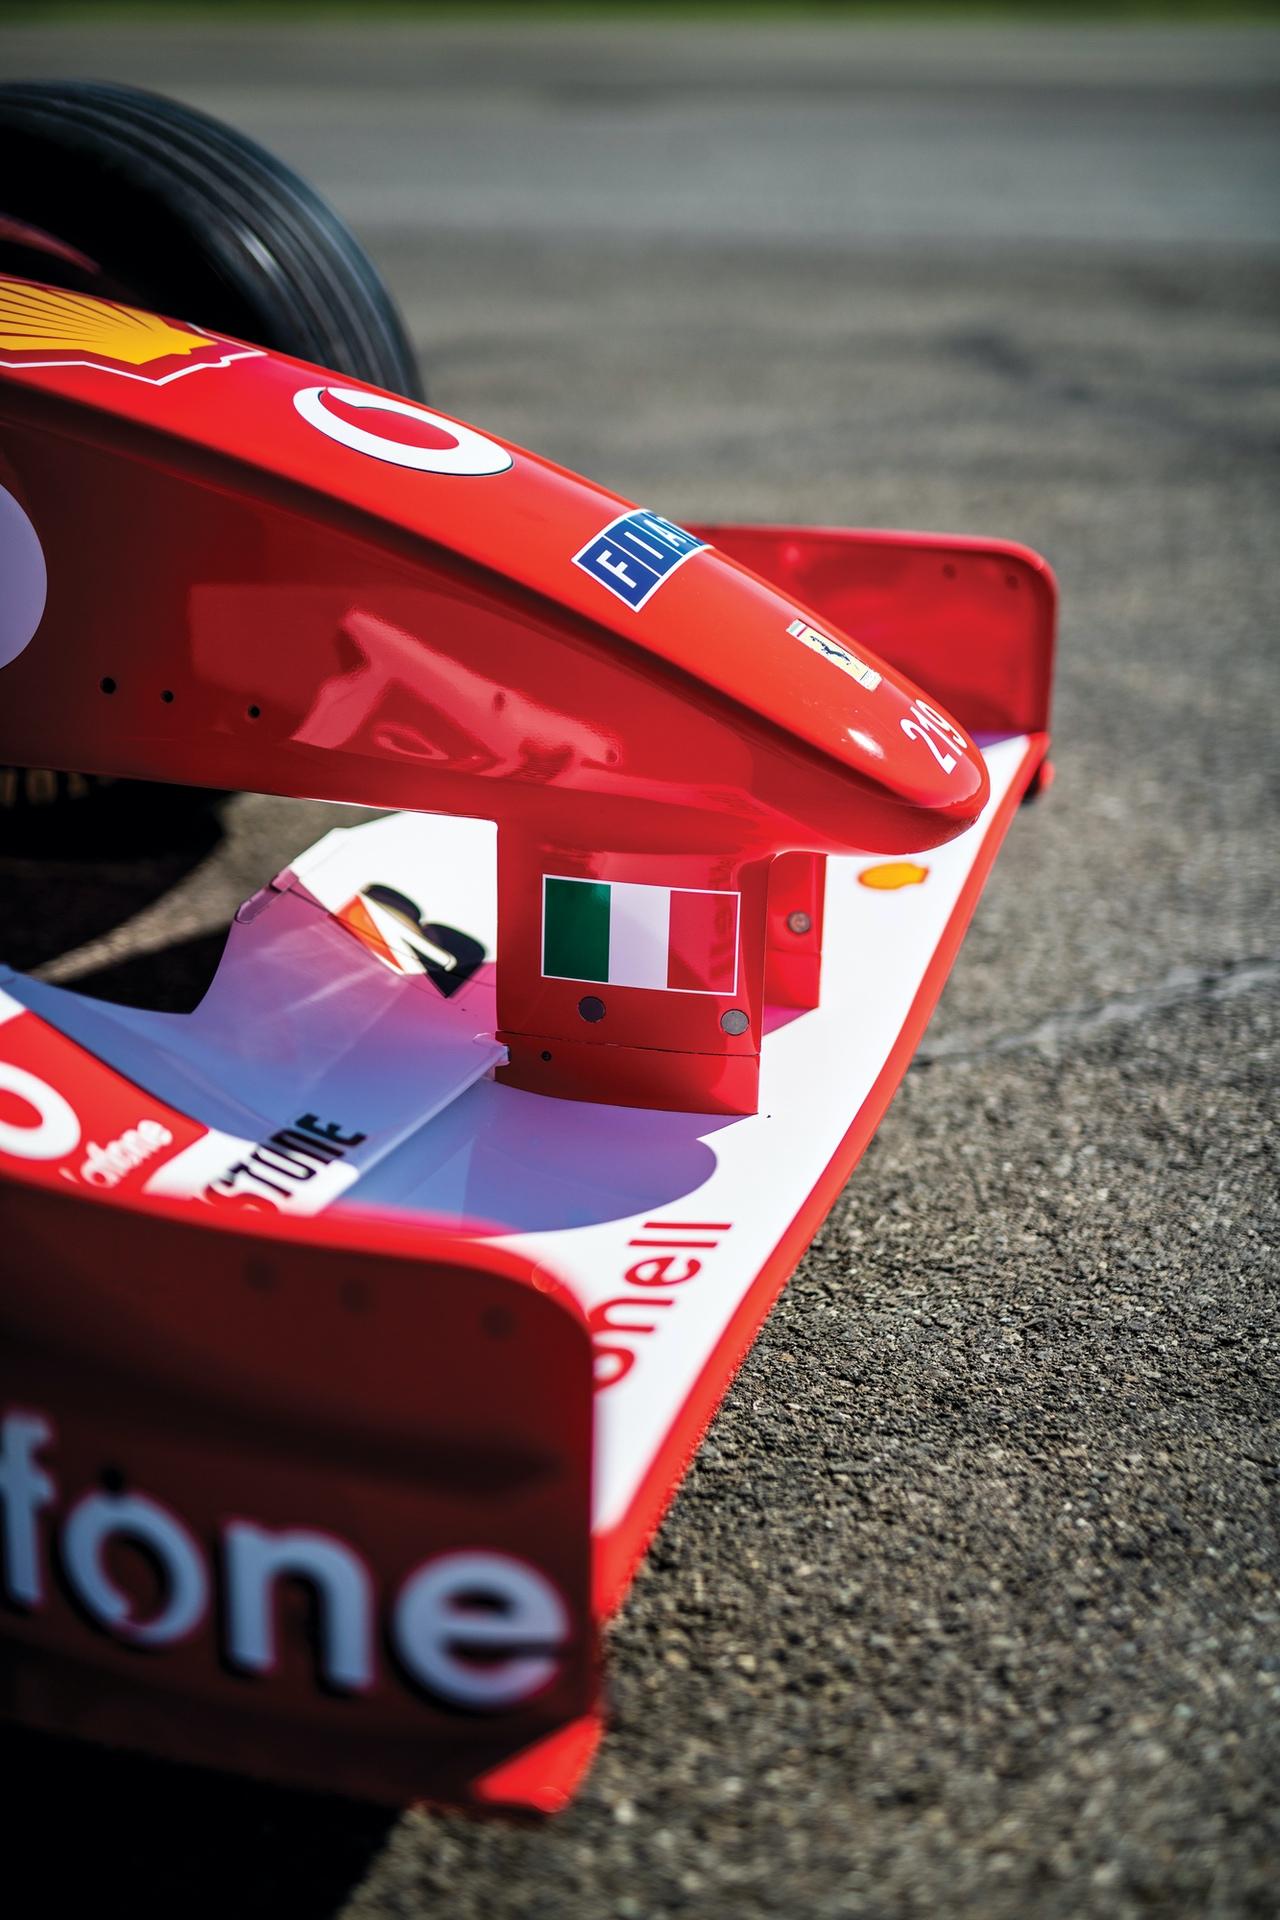 Mick_Schumacher_Ferrari_F2002_0044